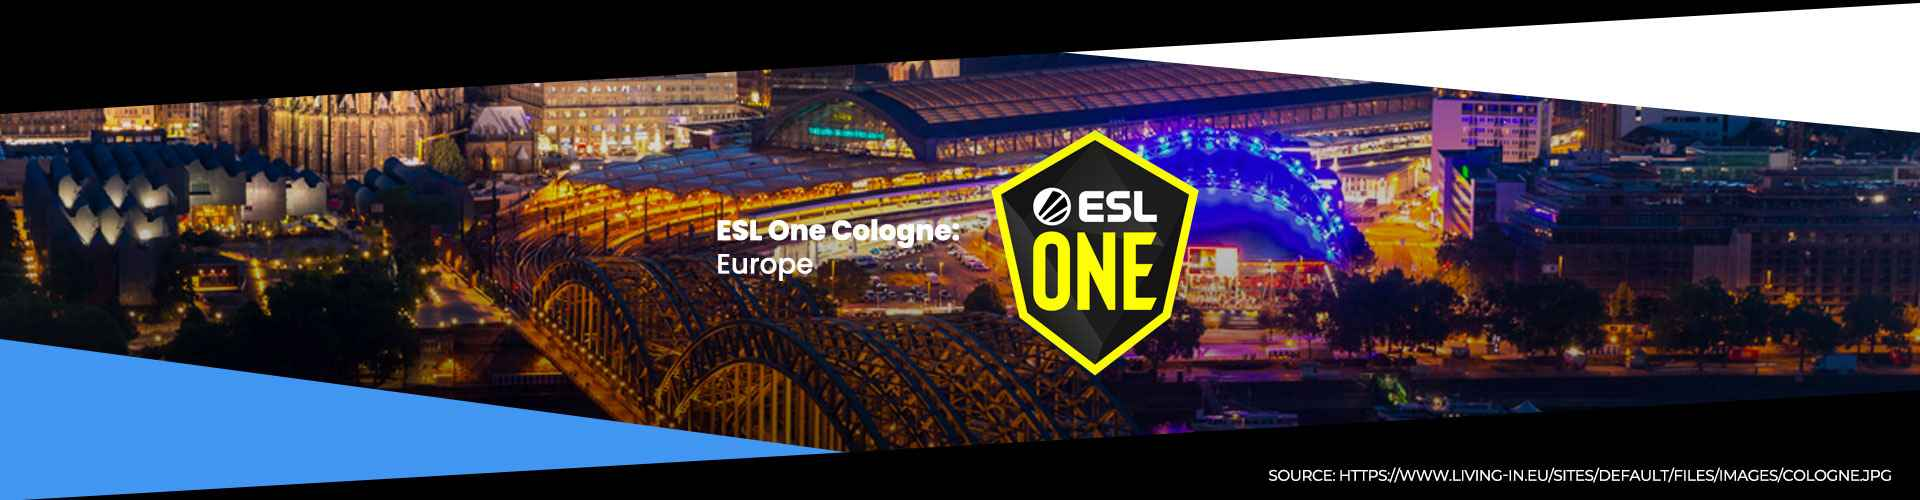 Turneringssida för ESL One Cologne: Europa